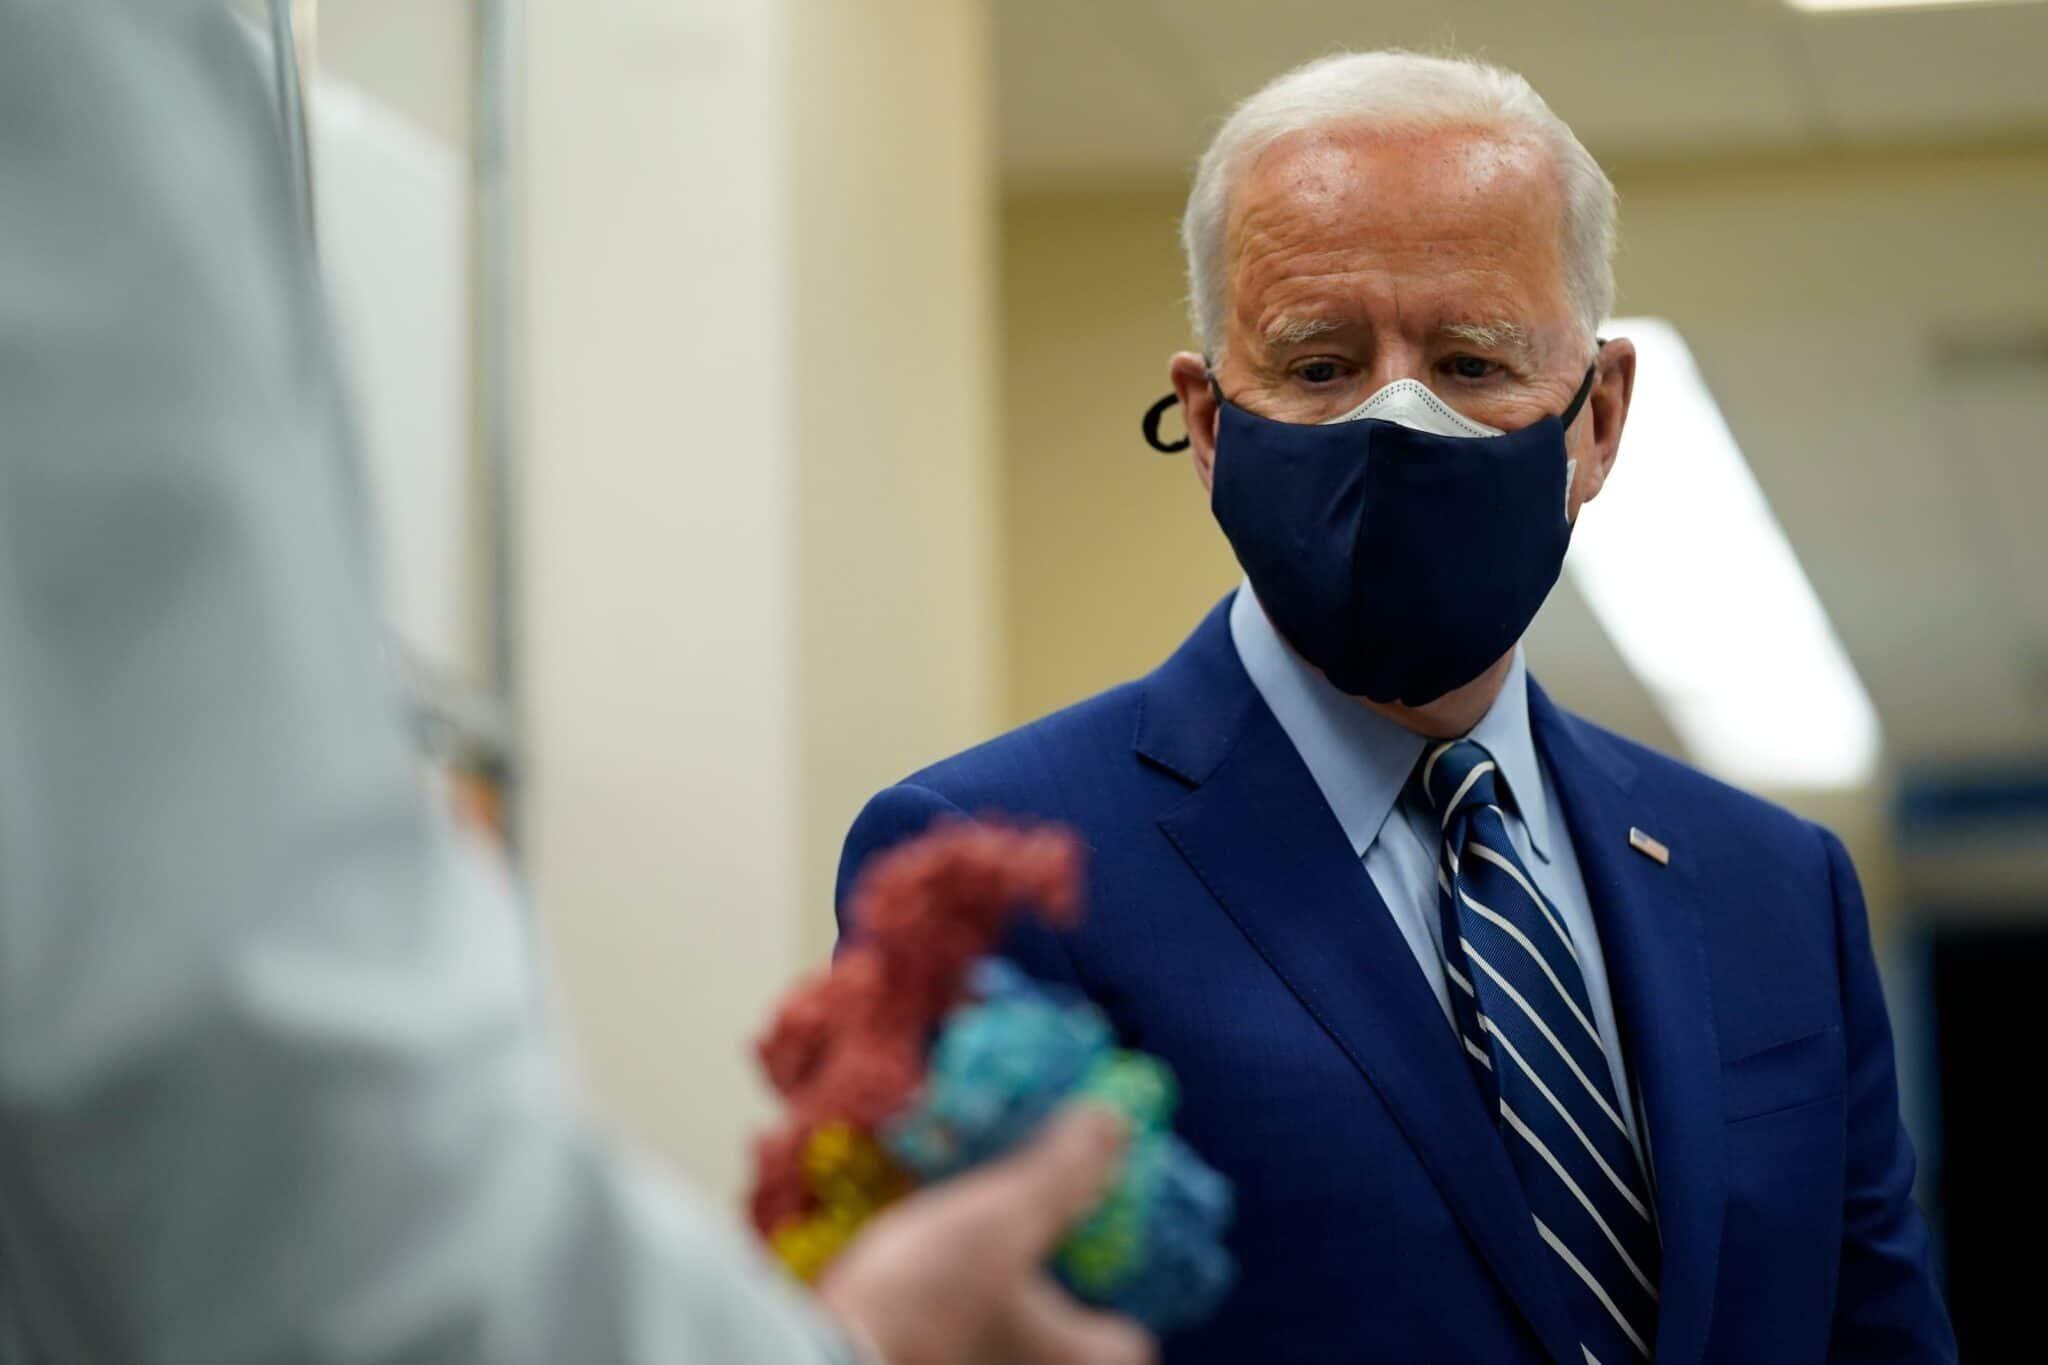 joe biden in double facemask